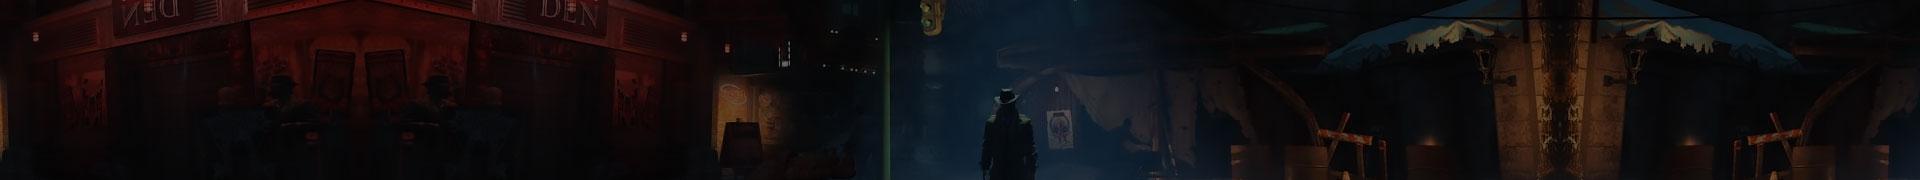 Fallout 4 Creation Club Credits